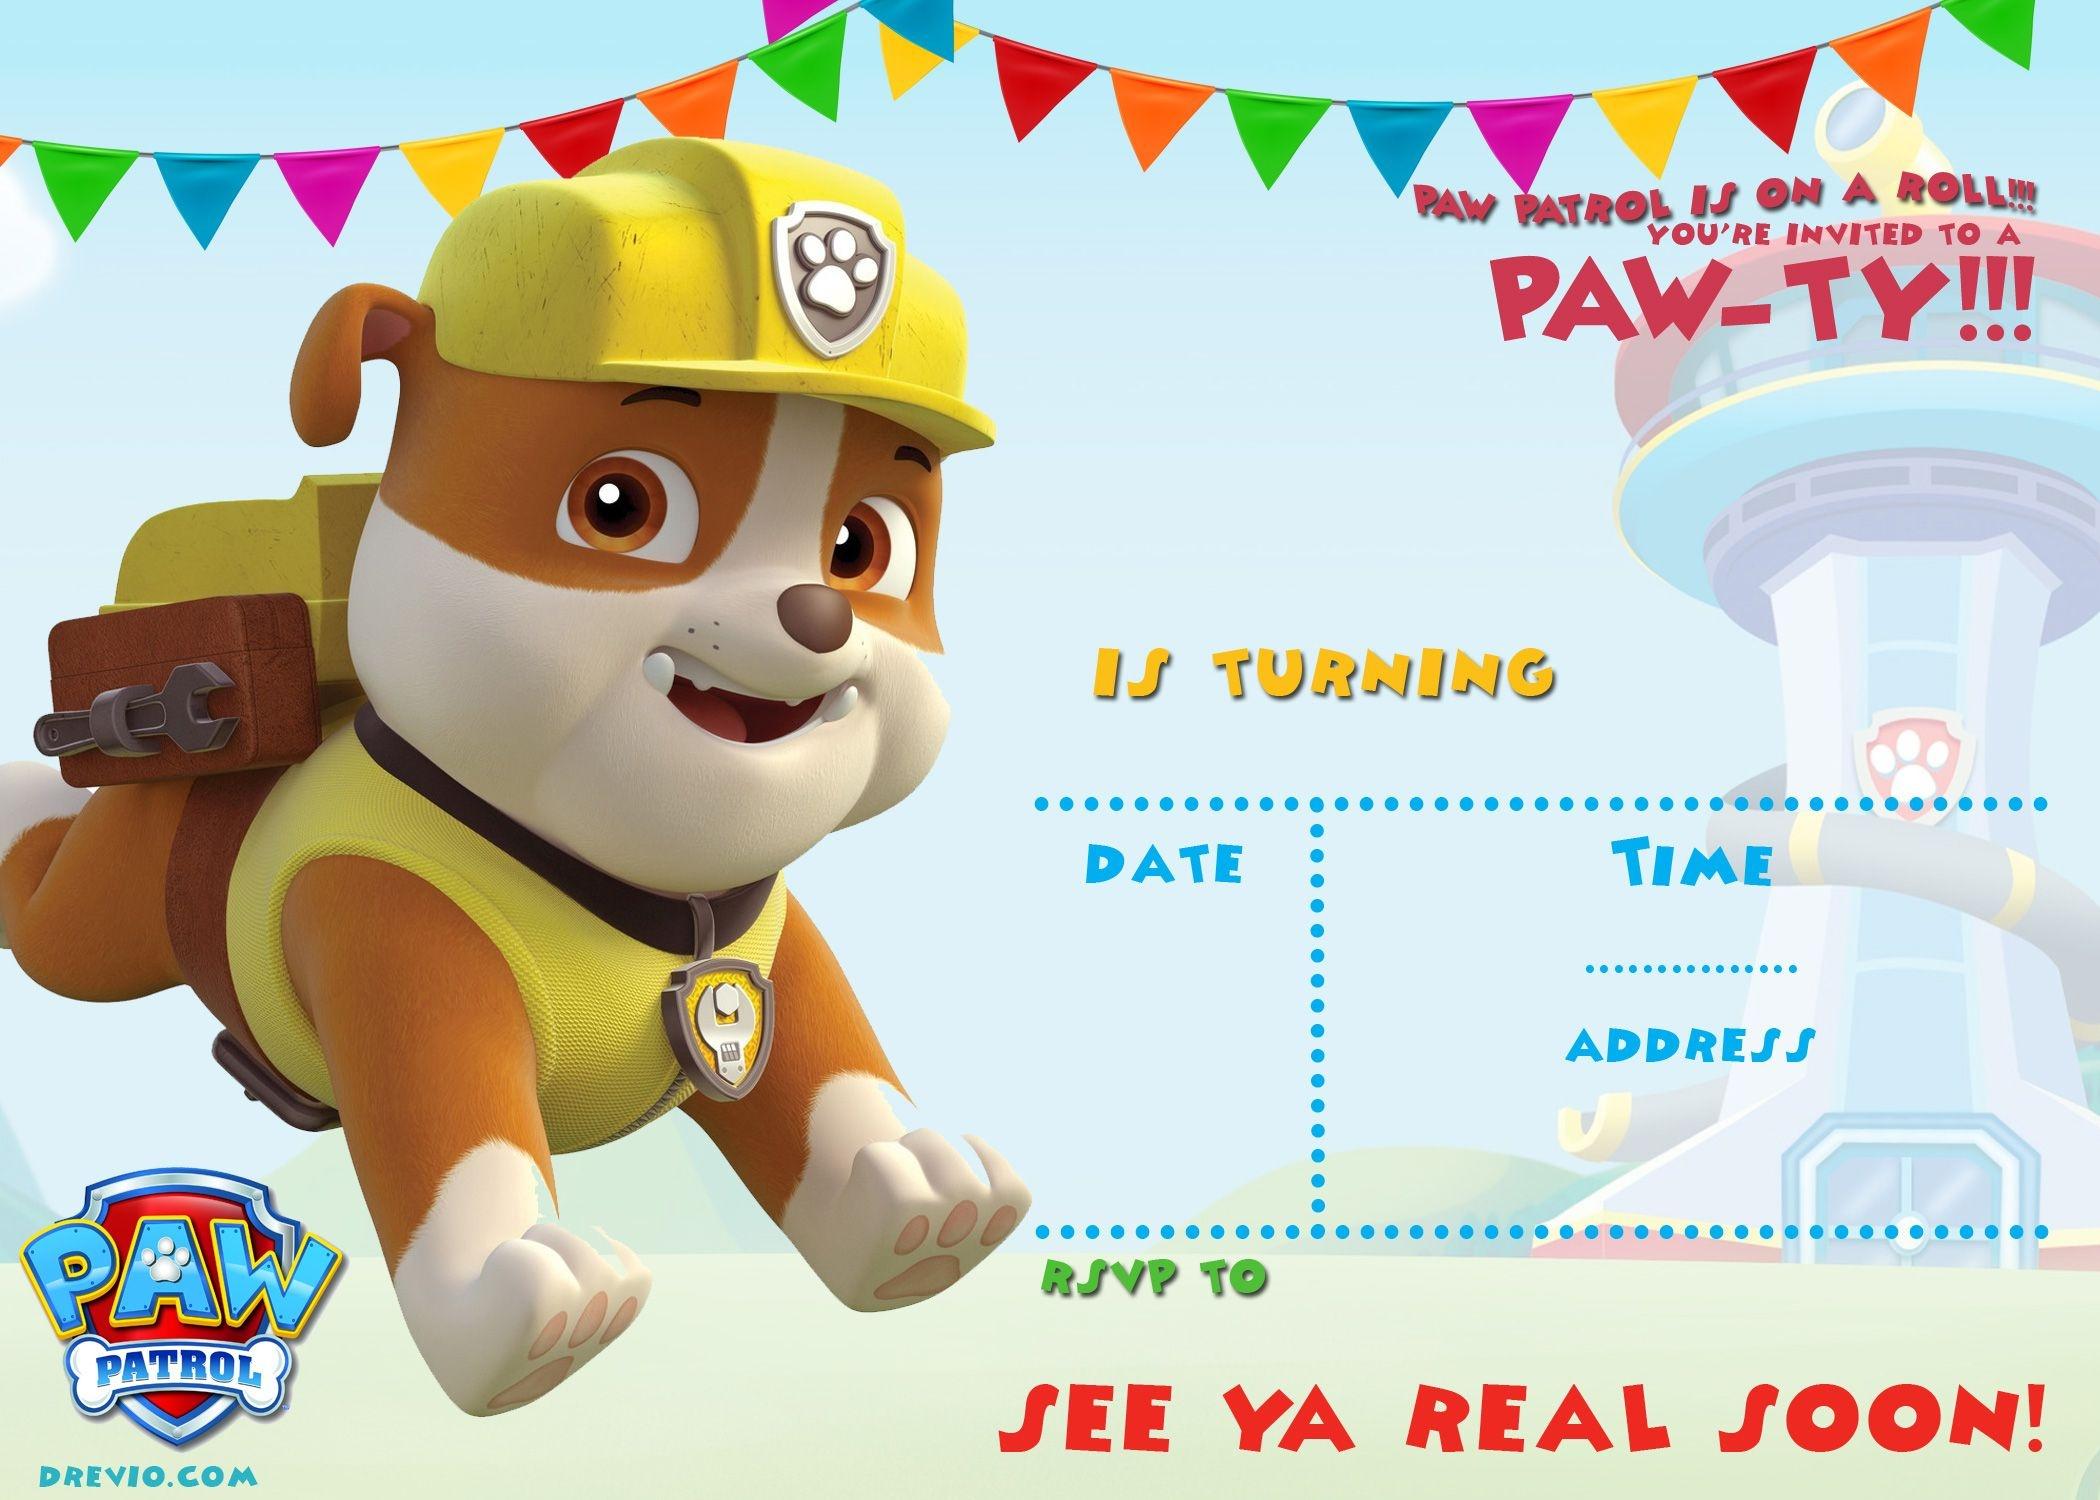 Free Printable Paw Patrol Invitation Template - All Characters - Free Printable Paw Patrol Invitations